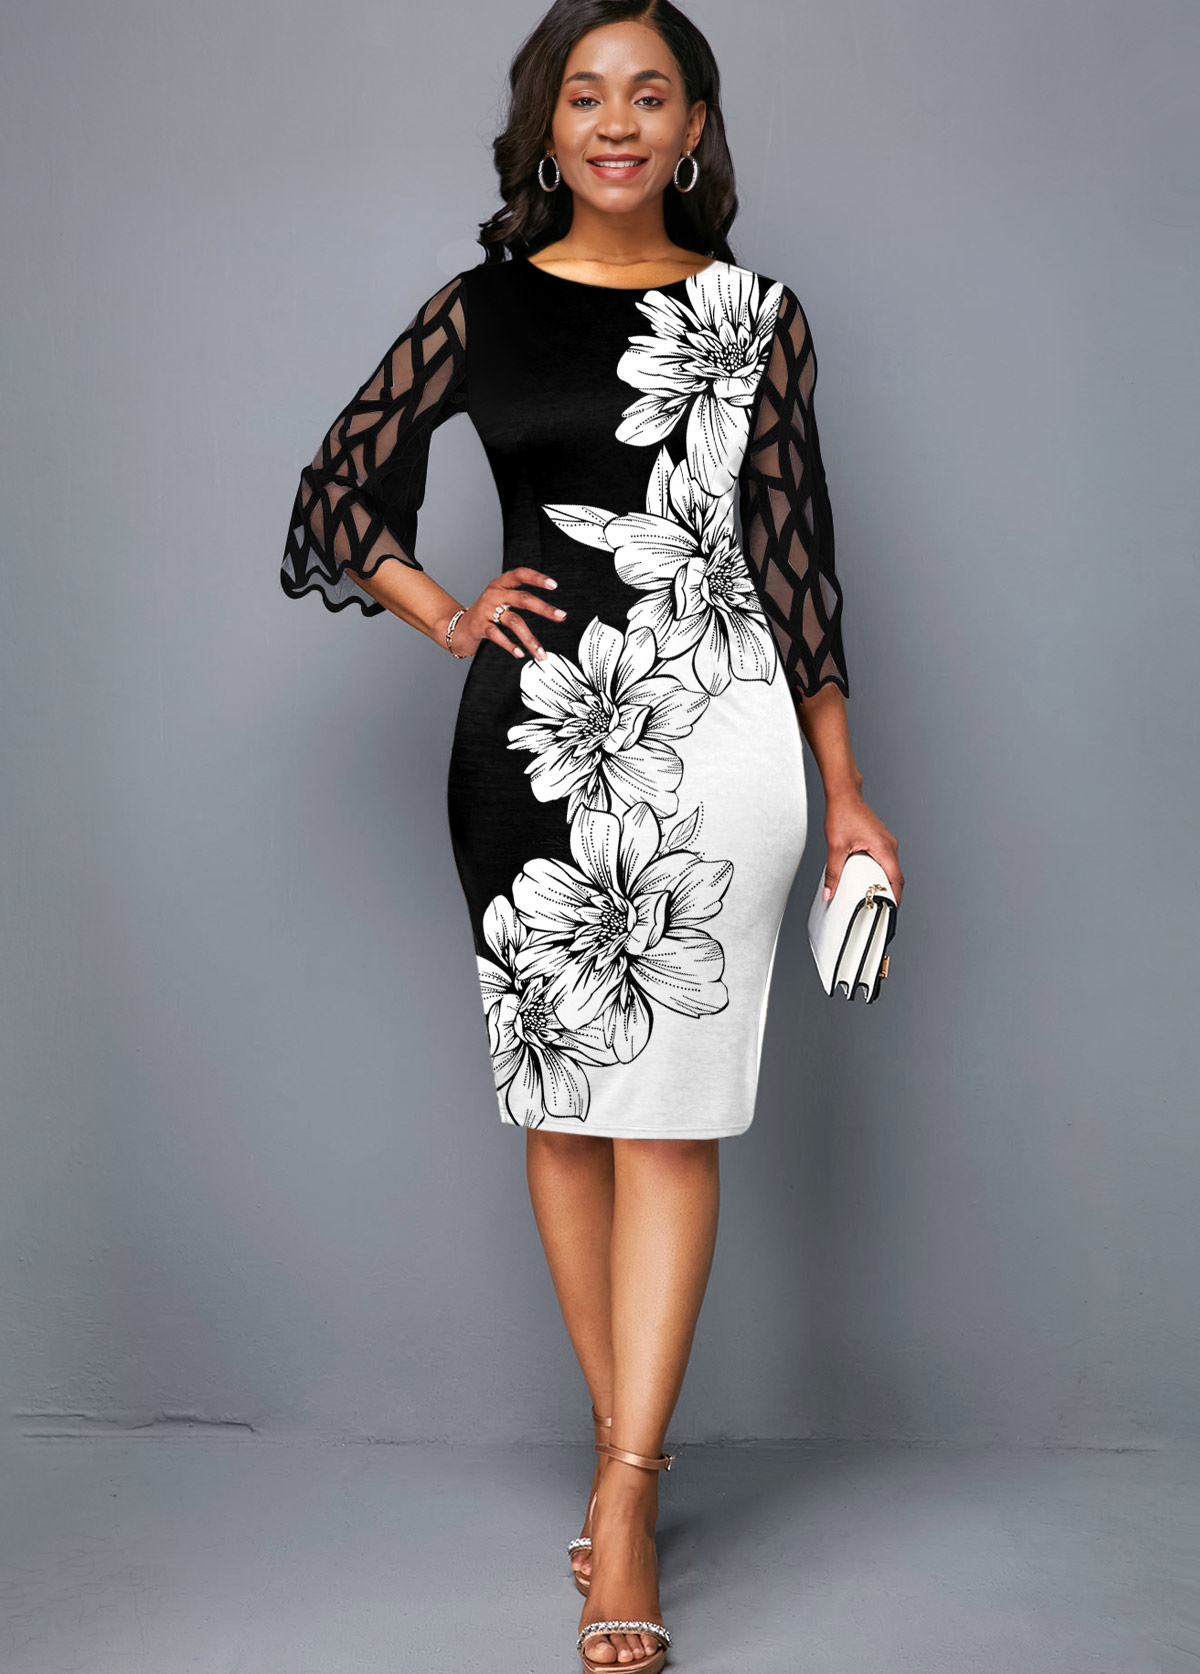 ROTITA Mesh Panel Round Neck Floral Print Dress